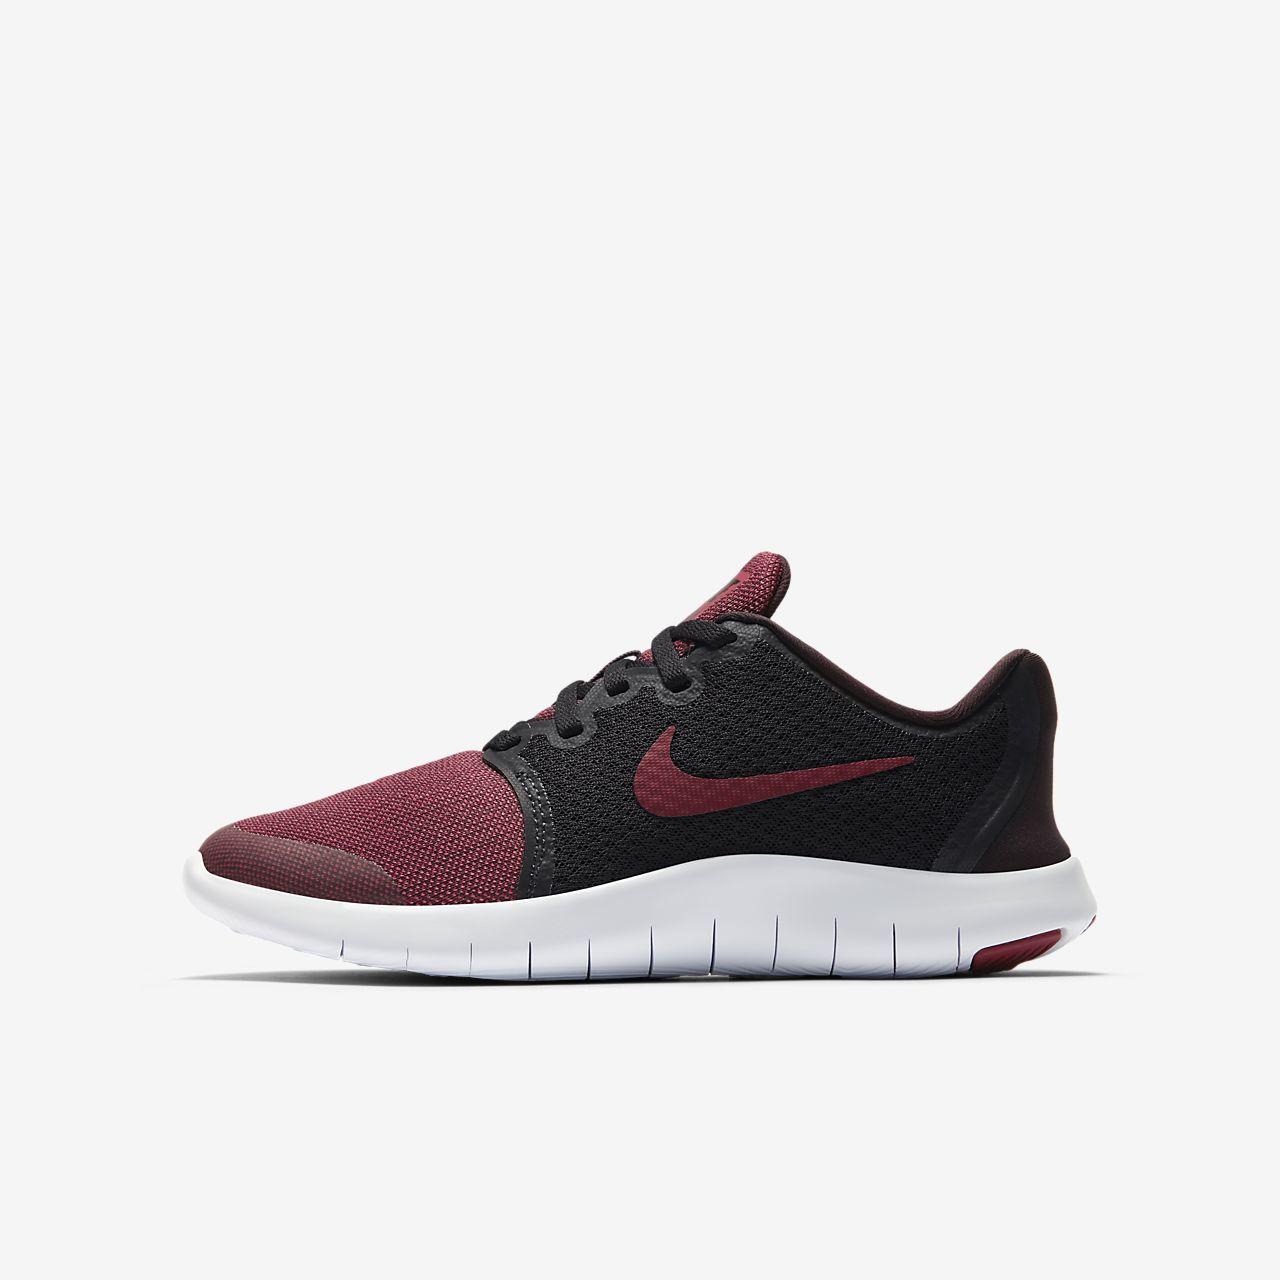 Ragazzi 2 Scarpa Flex Nike Contact Da Running Ch xTqYz